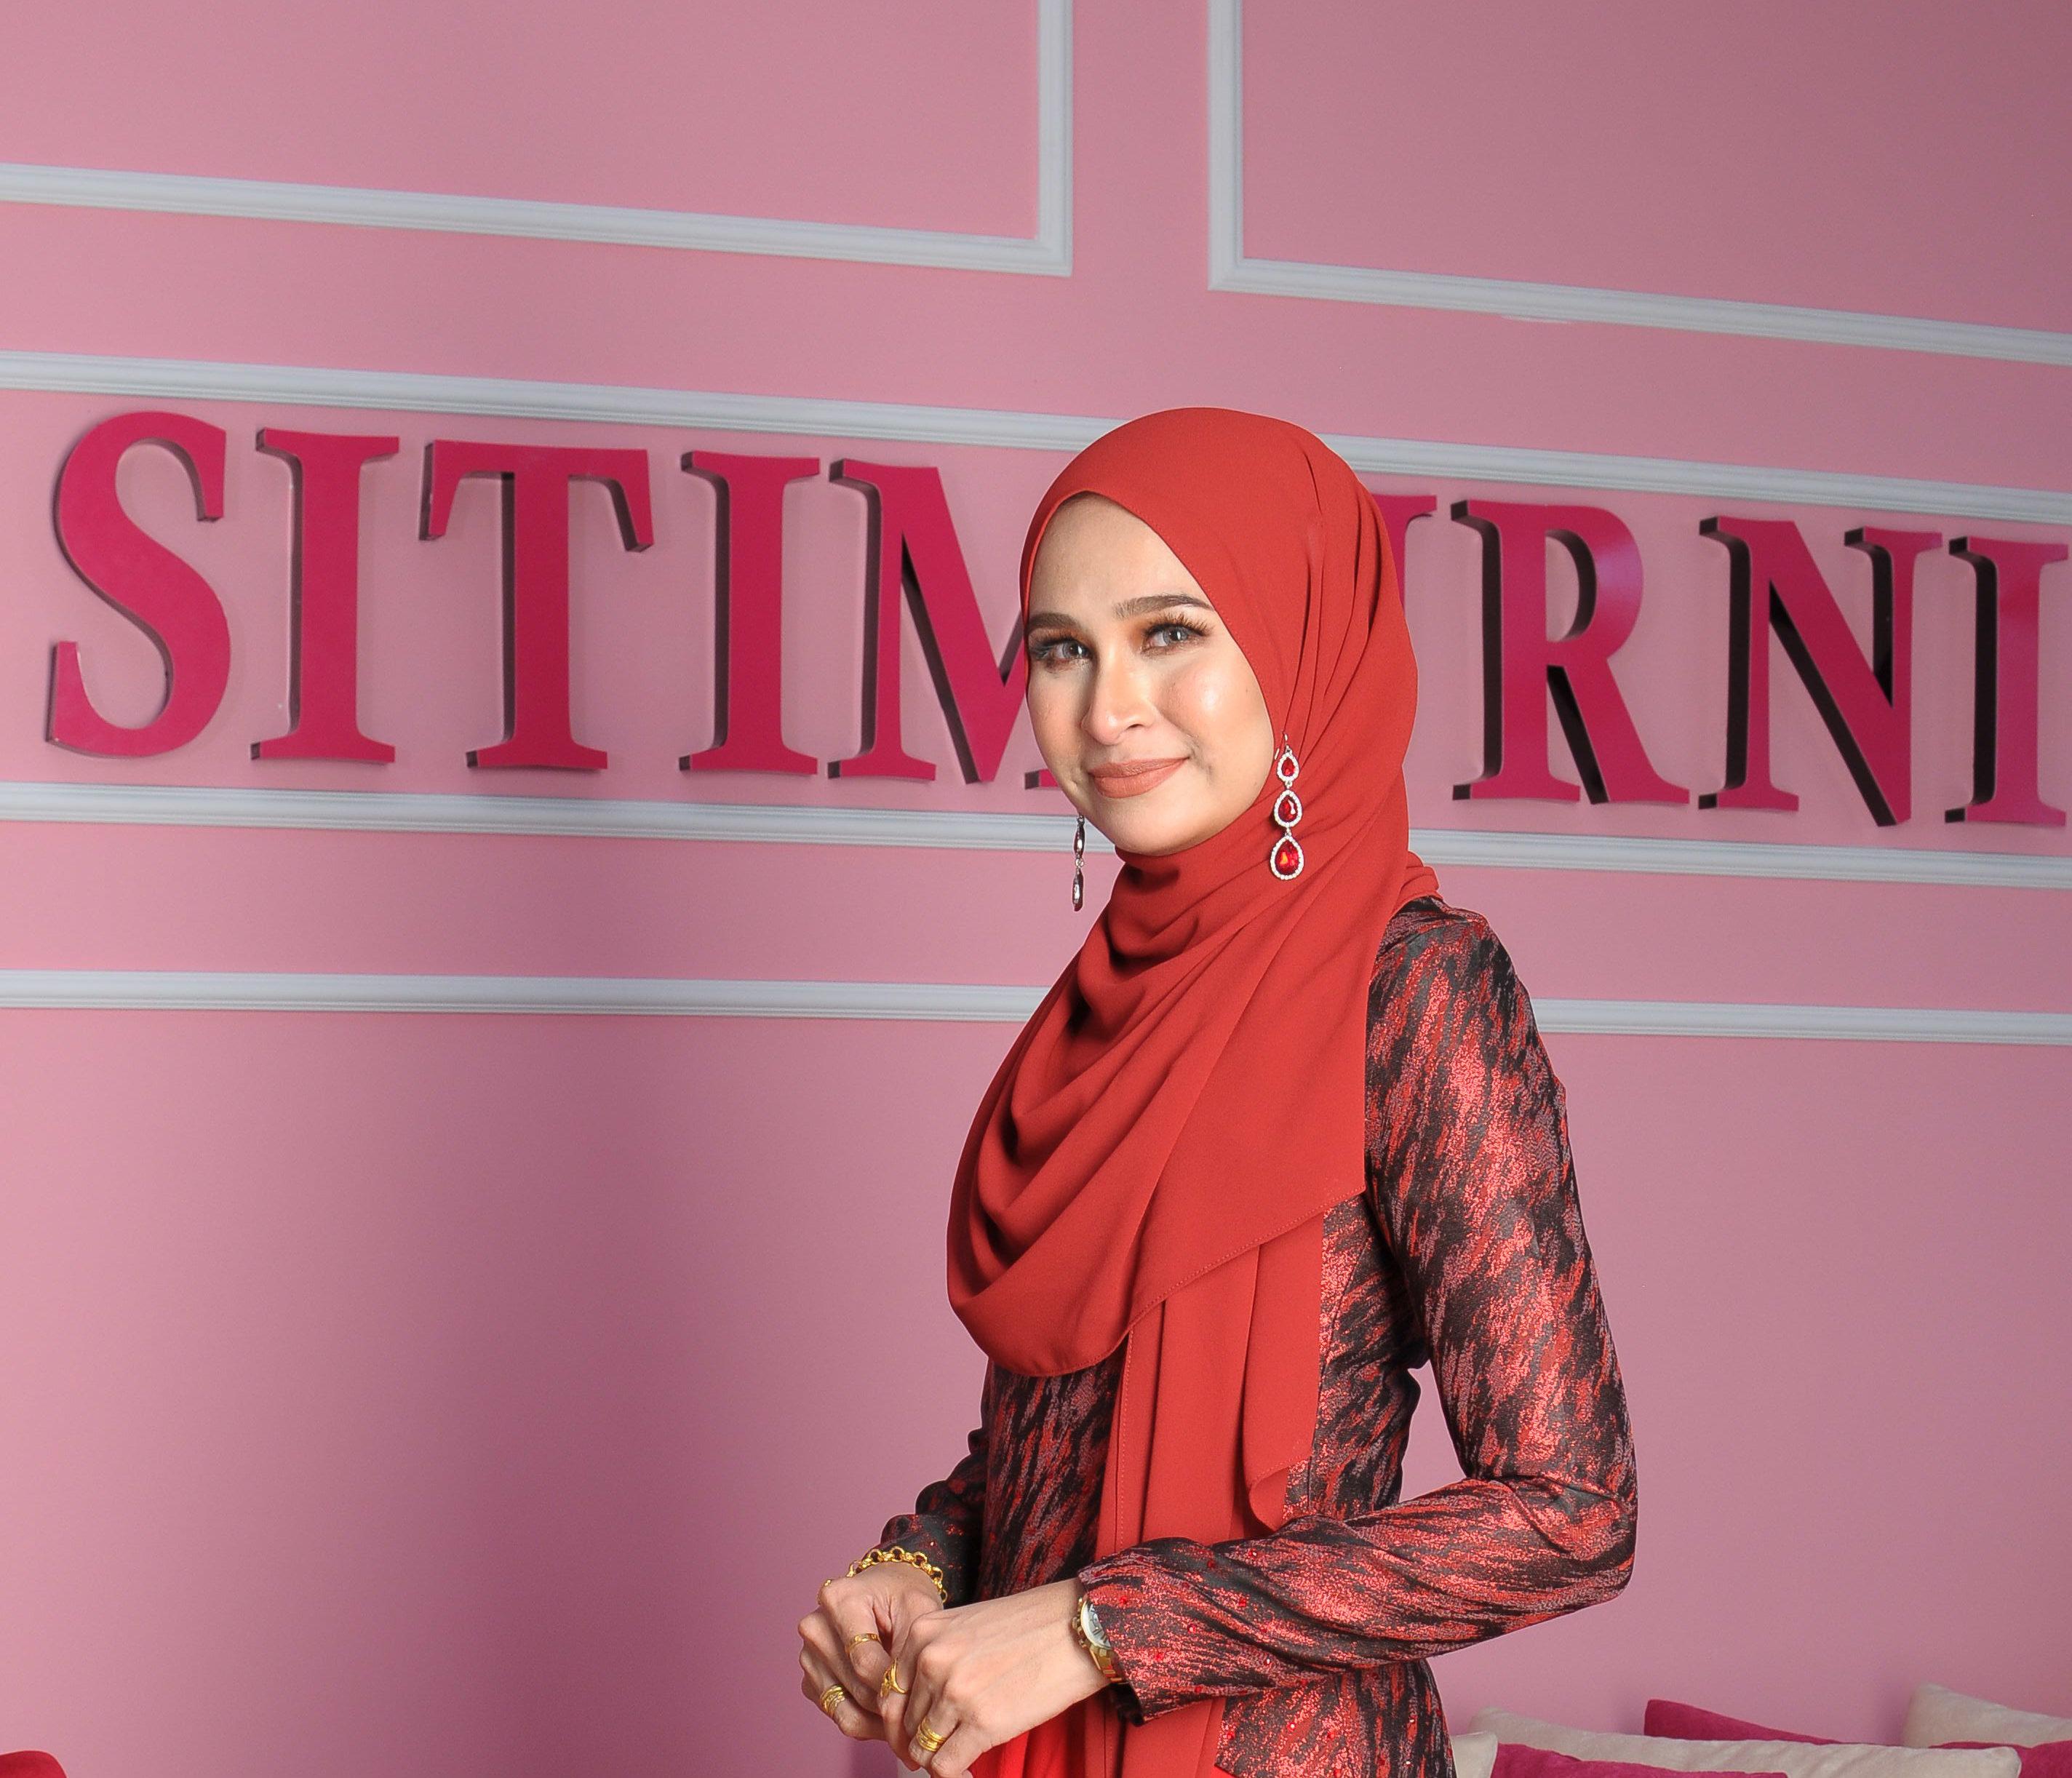 Siti Murni Abdul Aziz, the founder of SITIMURNI Holdings Sdn Bhd